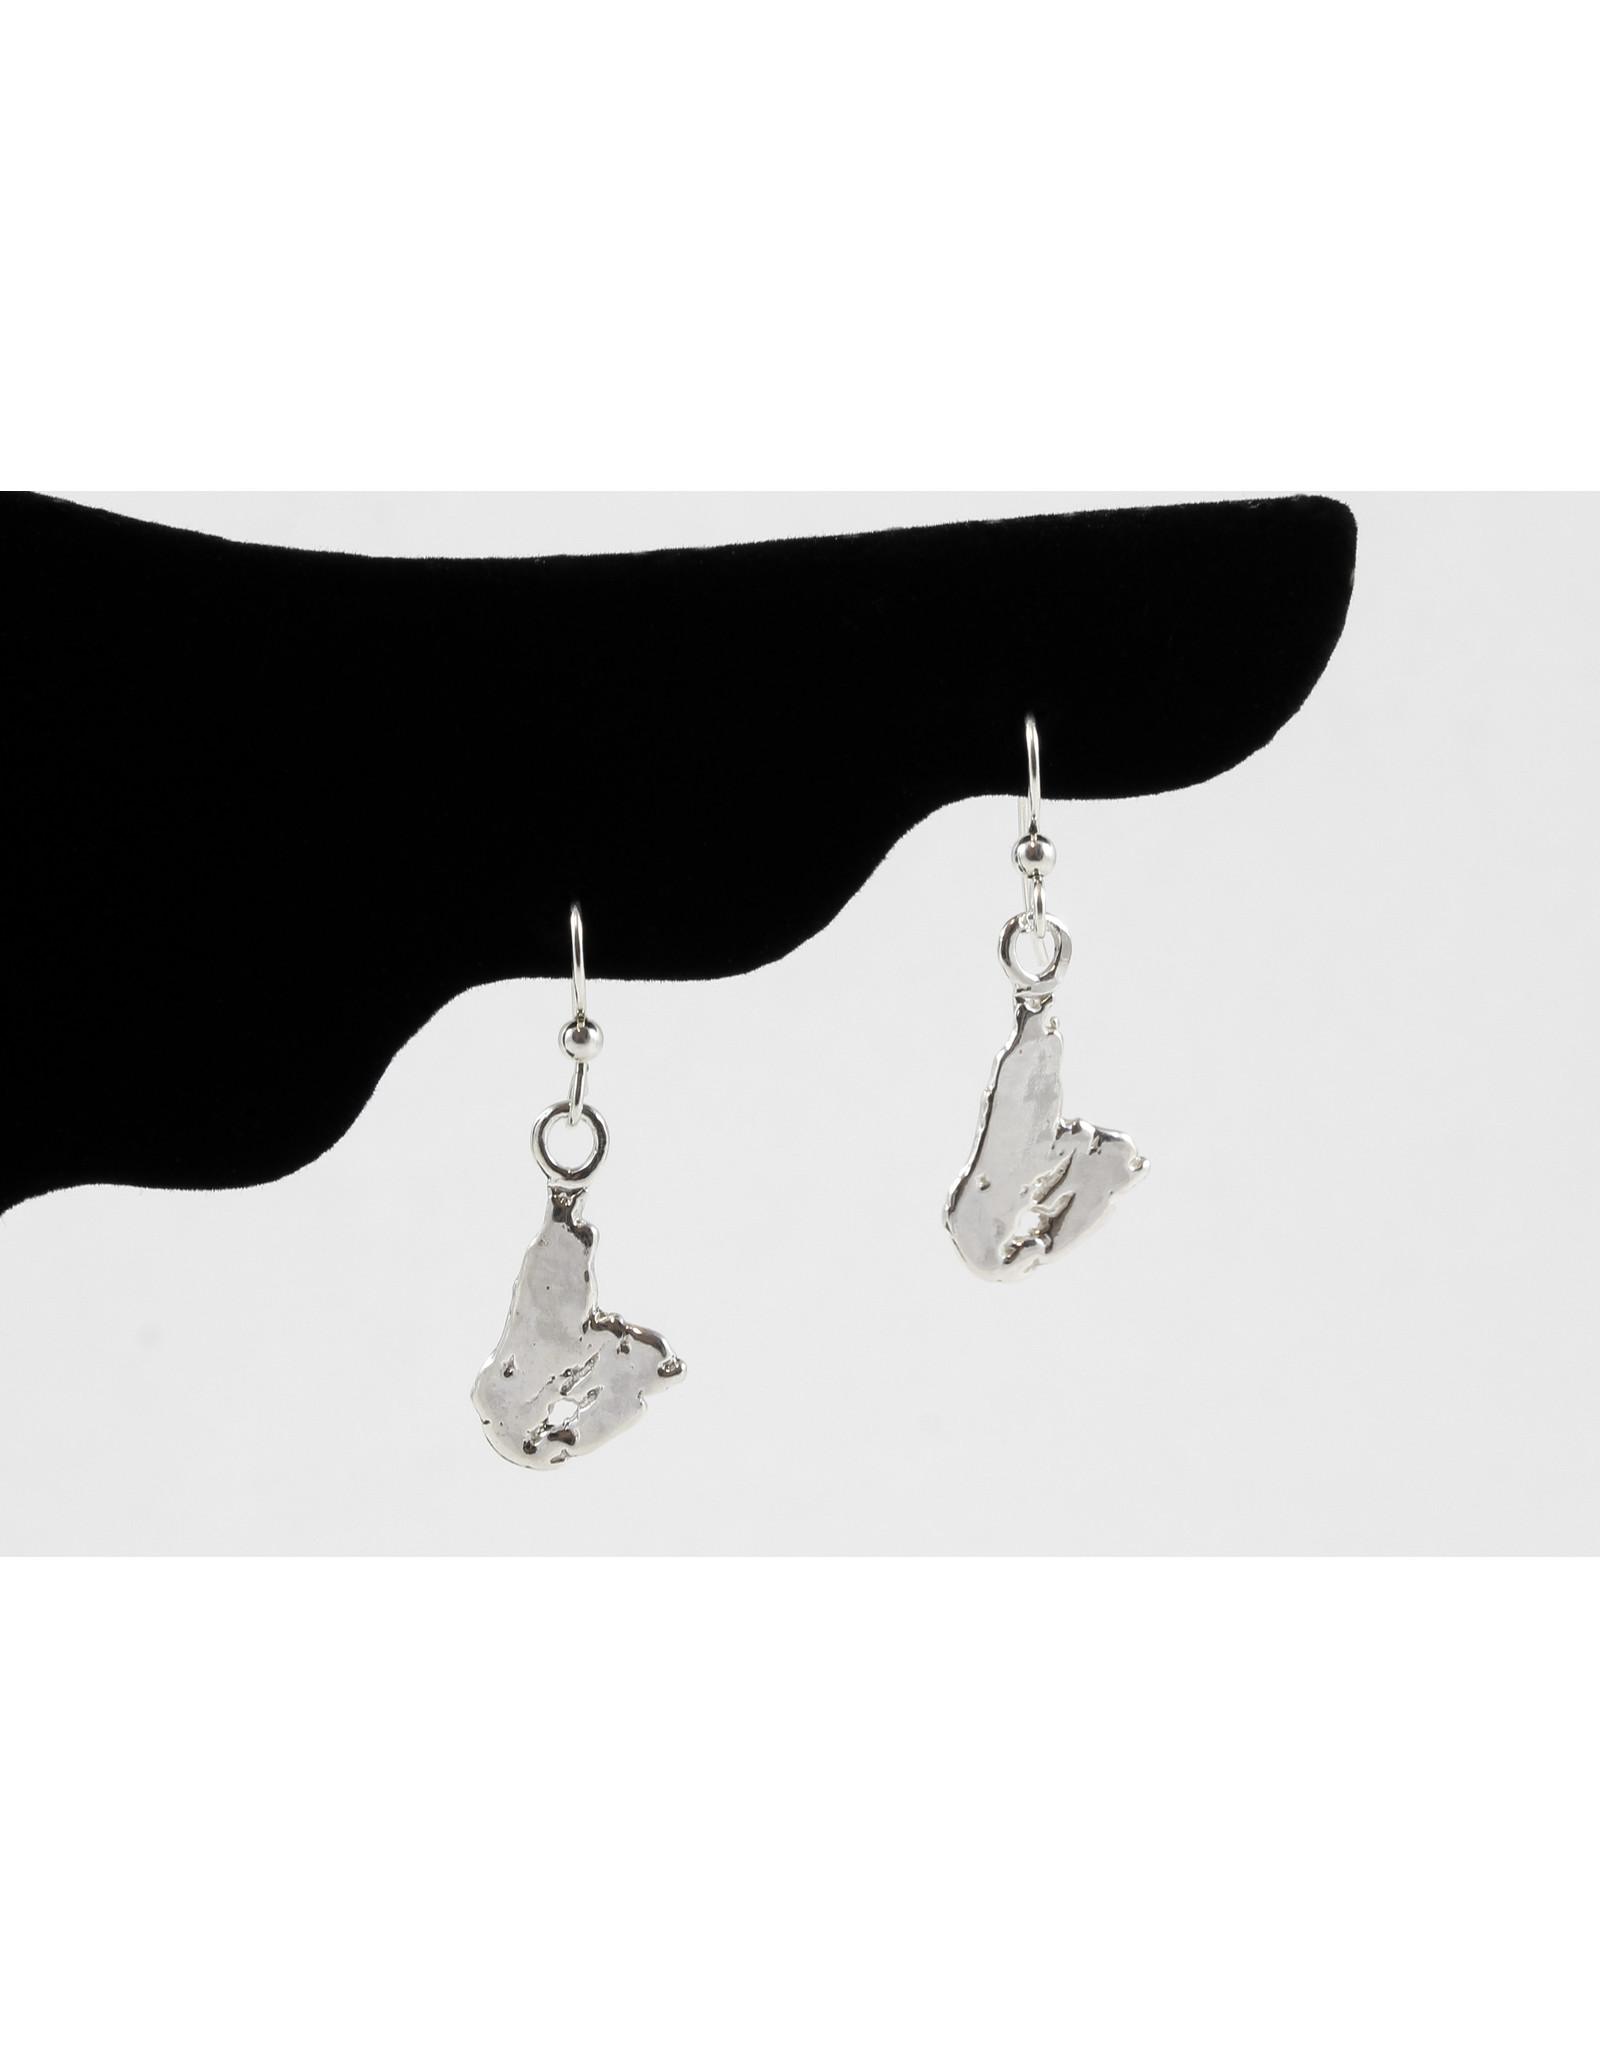 Darryl MacLeod Cape Breton Island Earrings by Darryl MacLeod